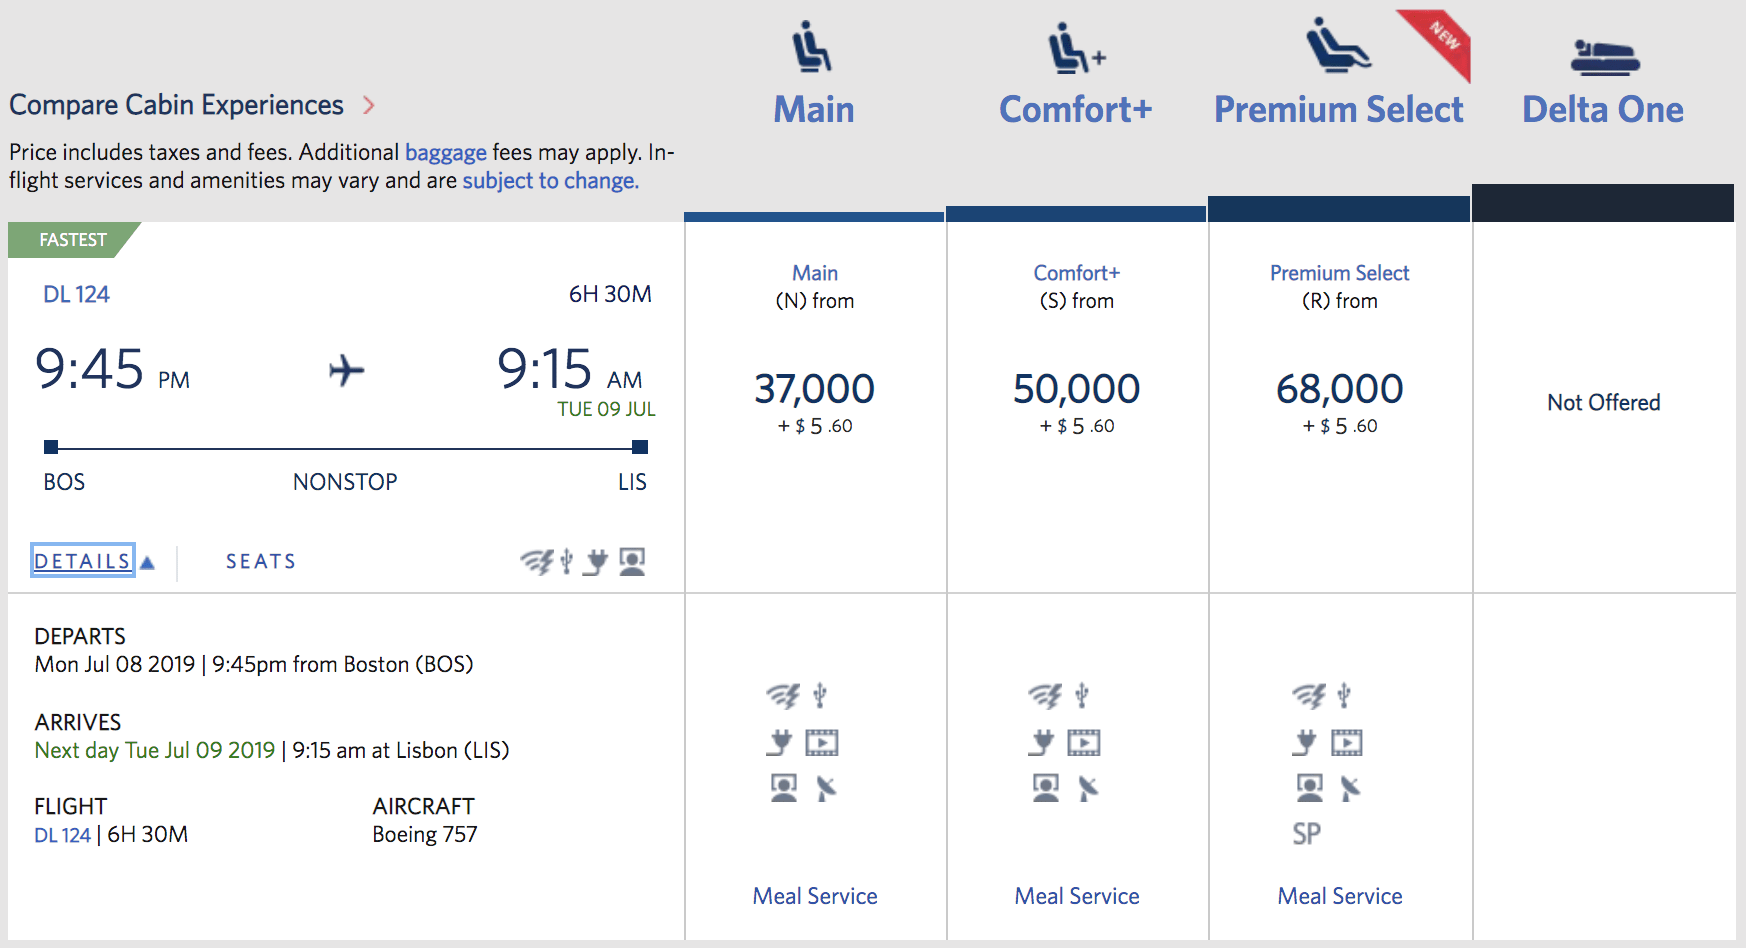 Delta's Best Planes for Transatlantic Premium Economy Class